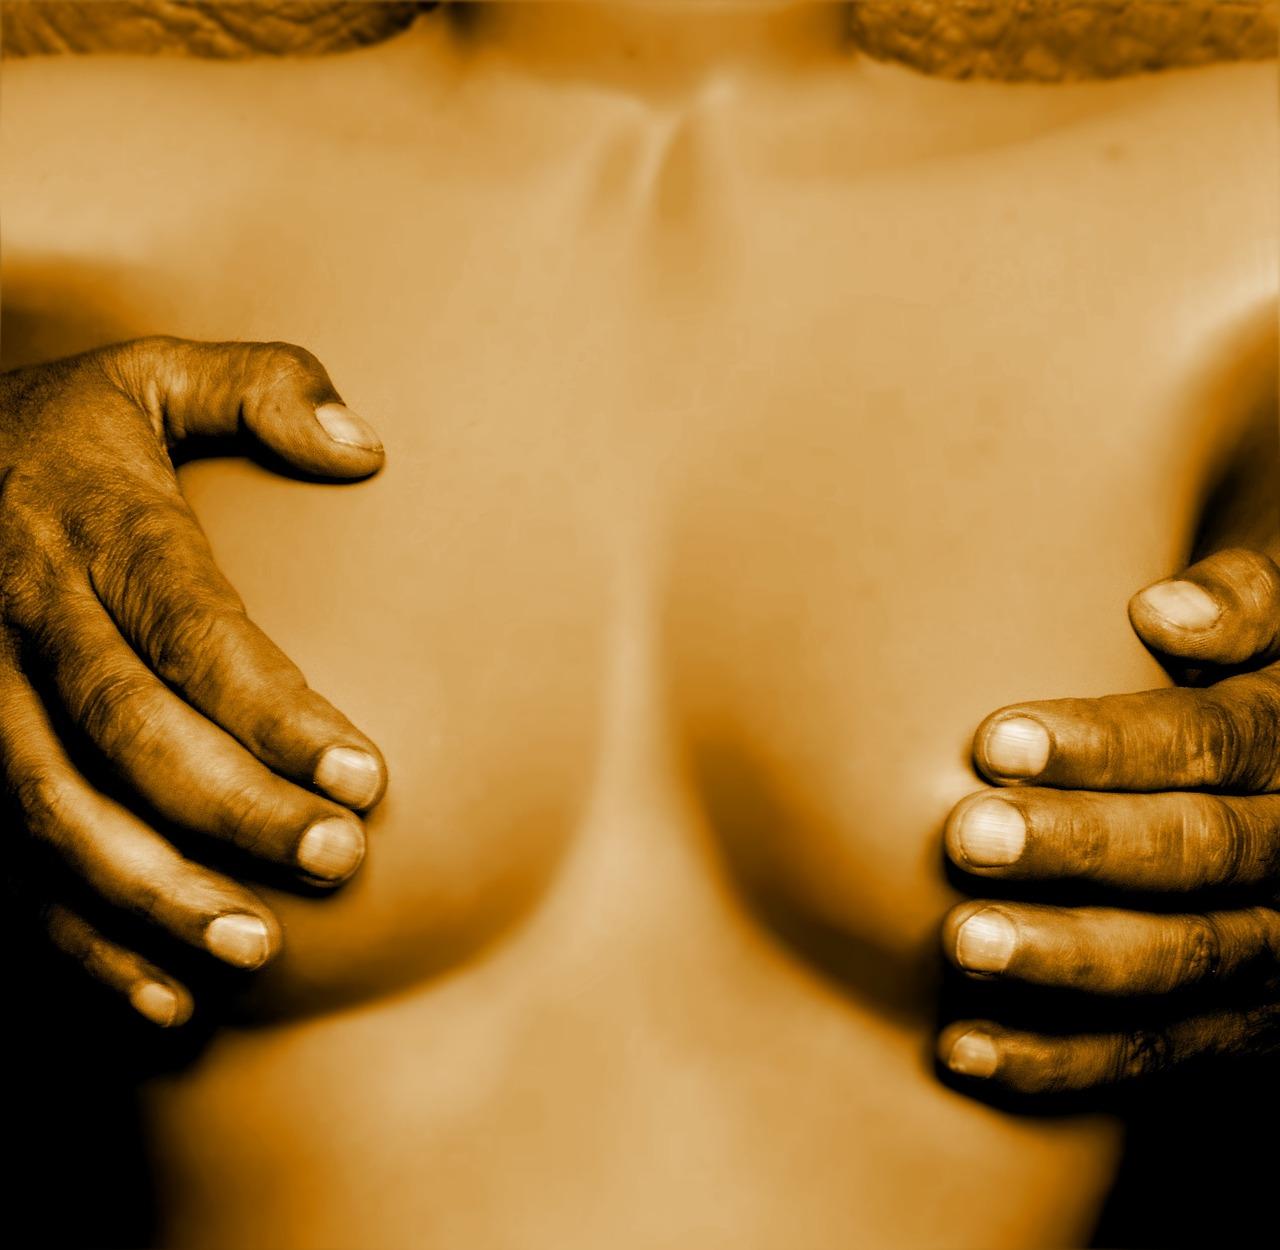 massage måløv sex i holbæk